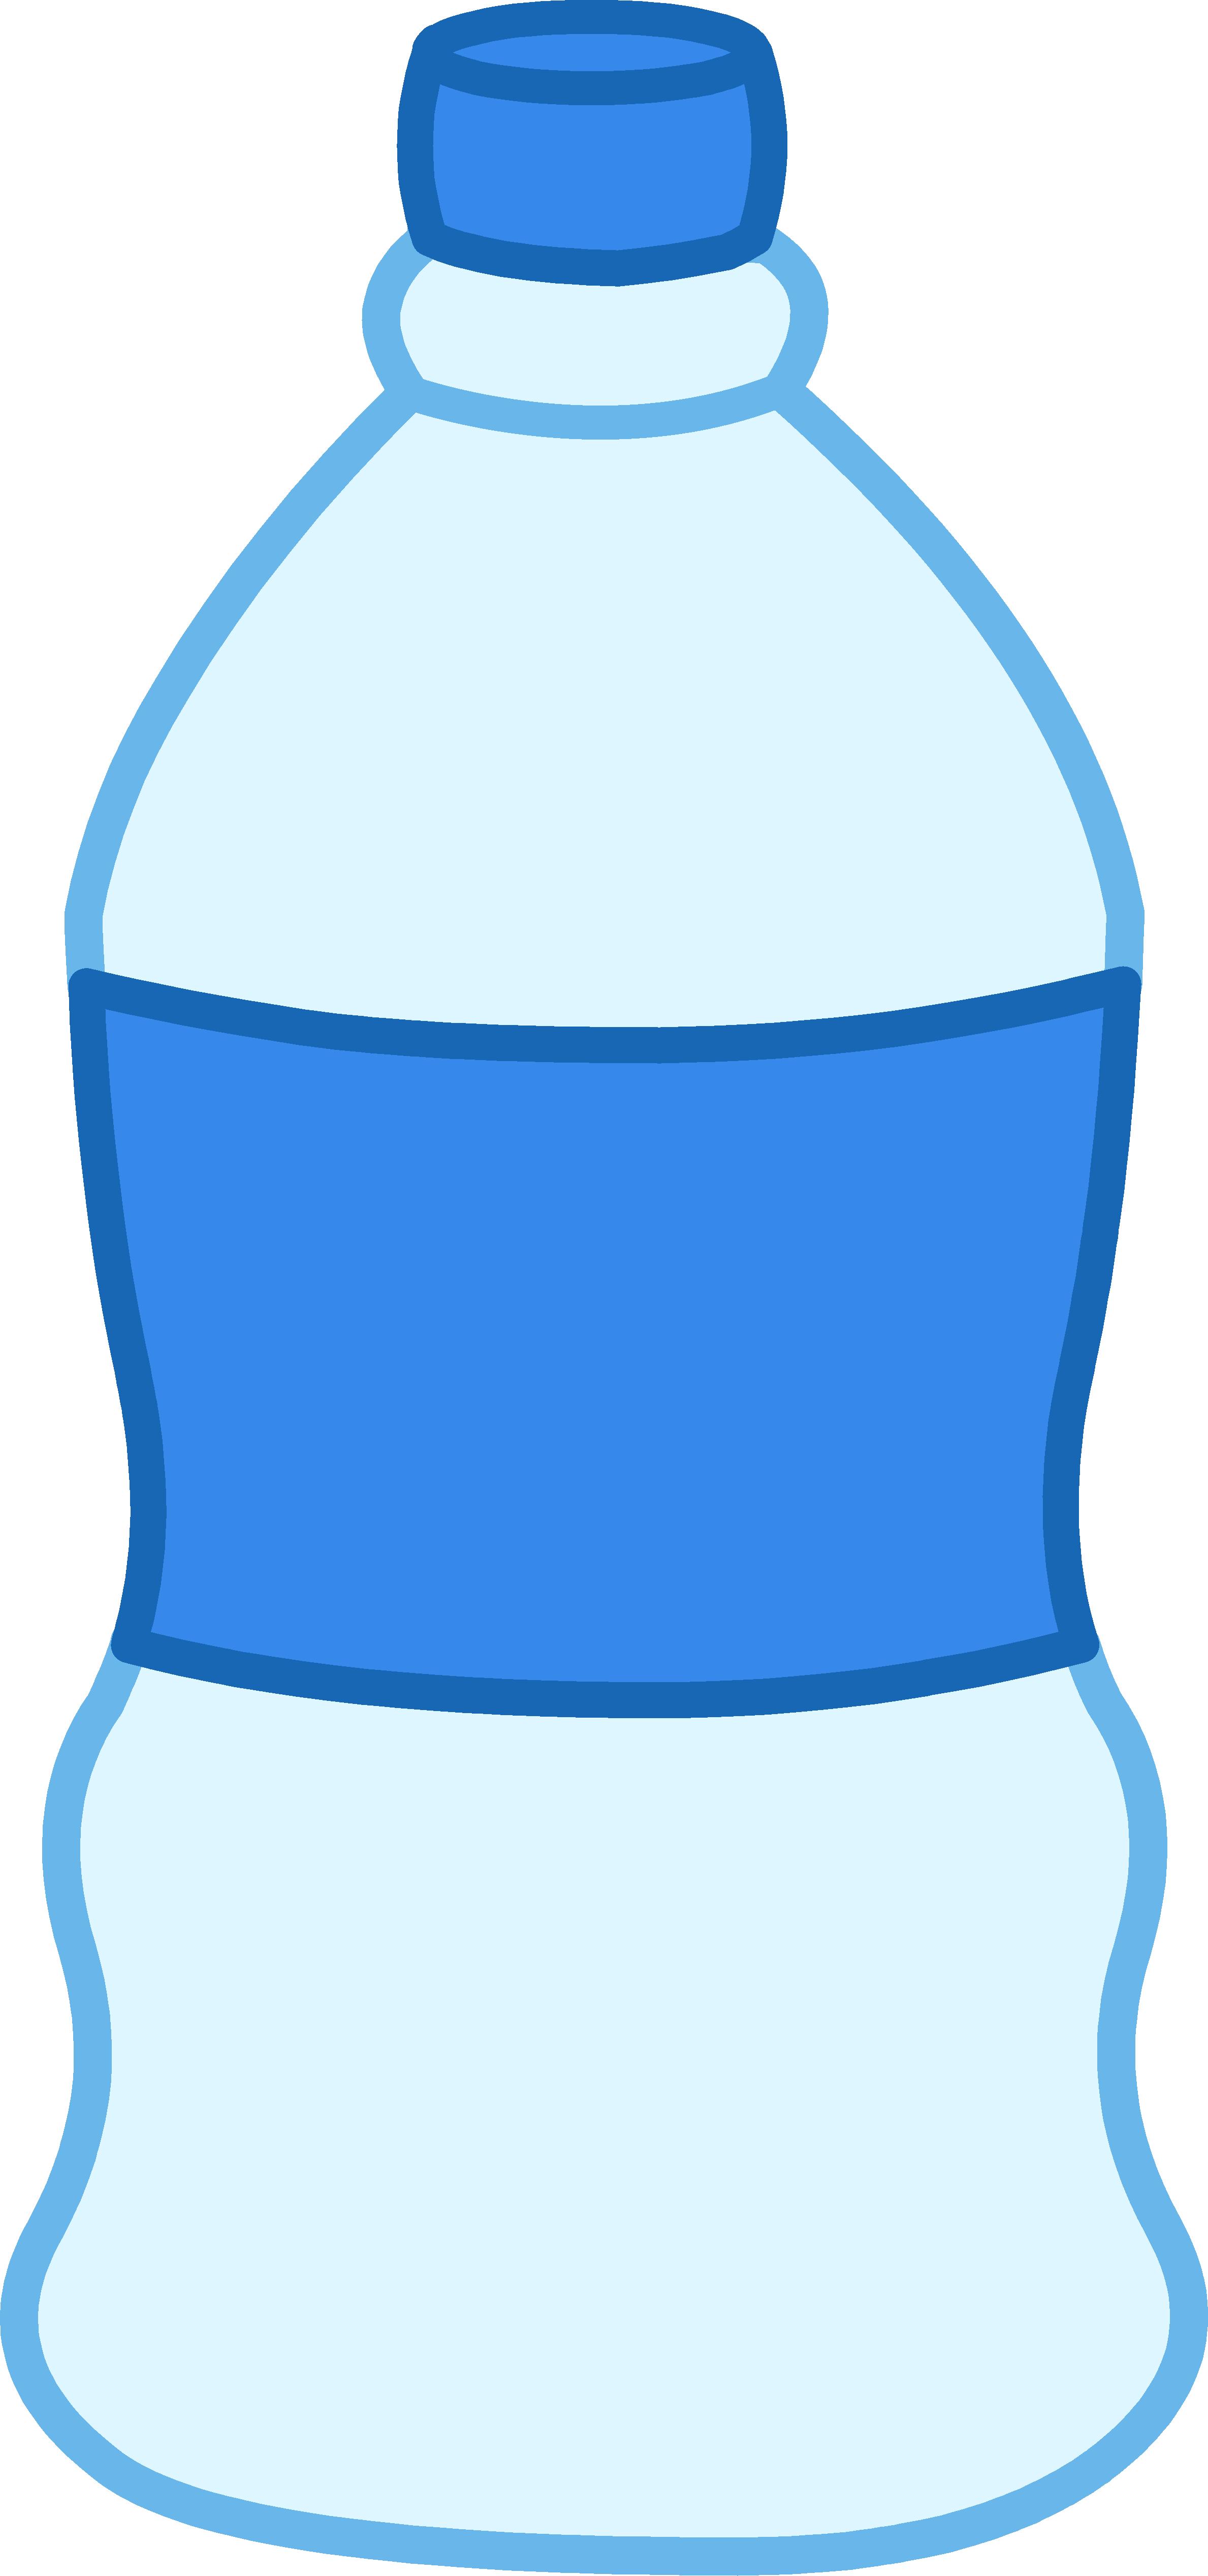 Water Clip Art